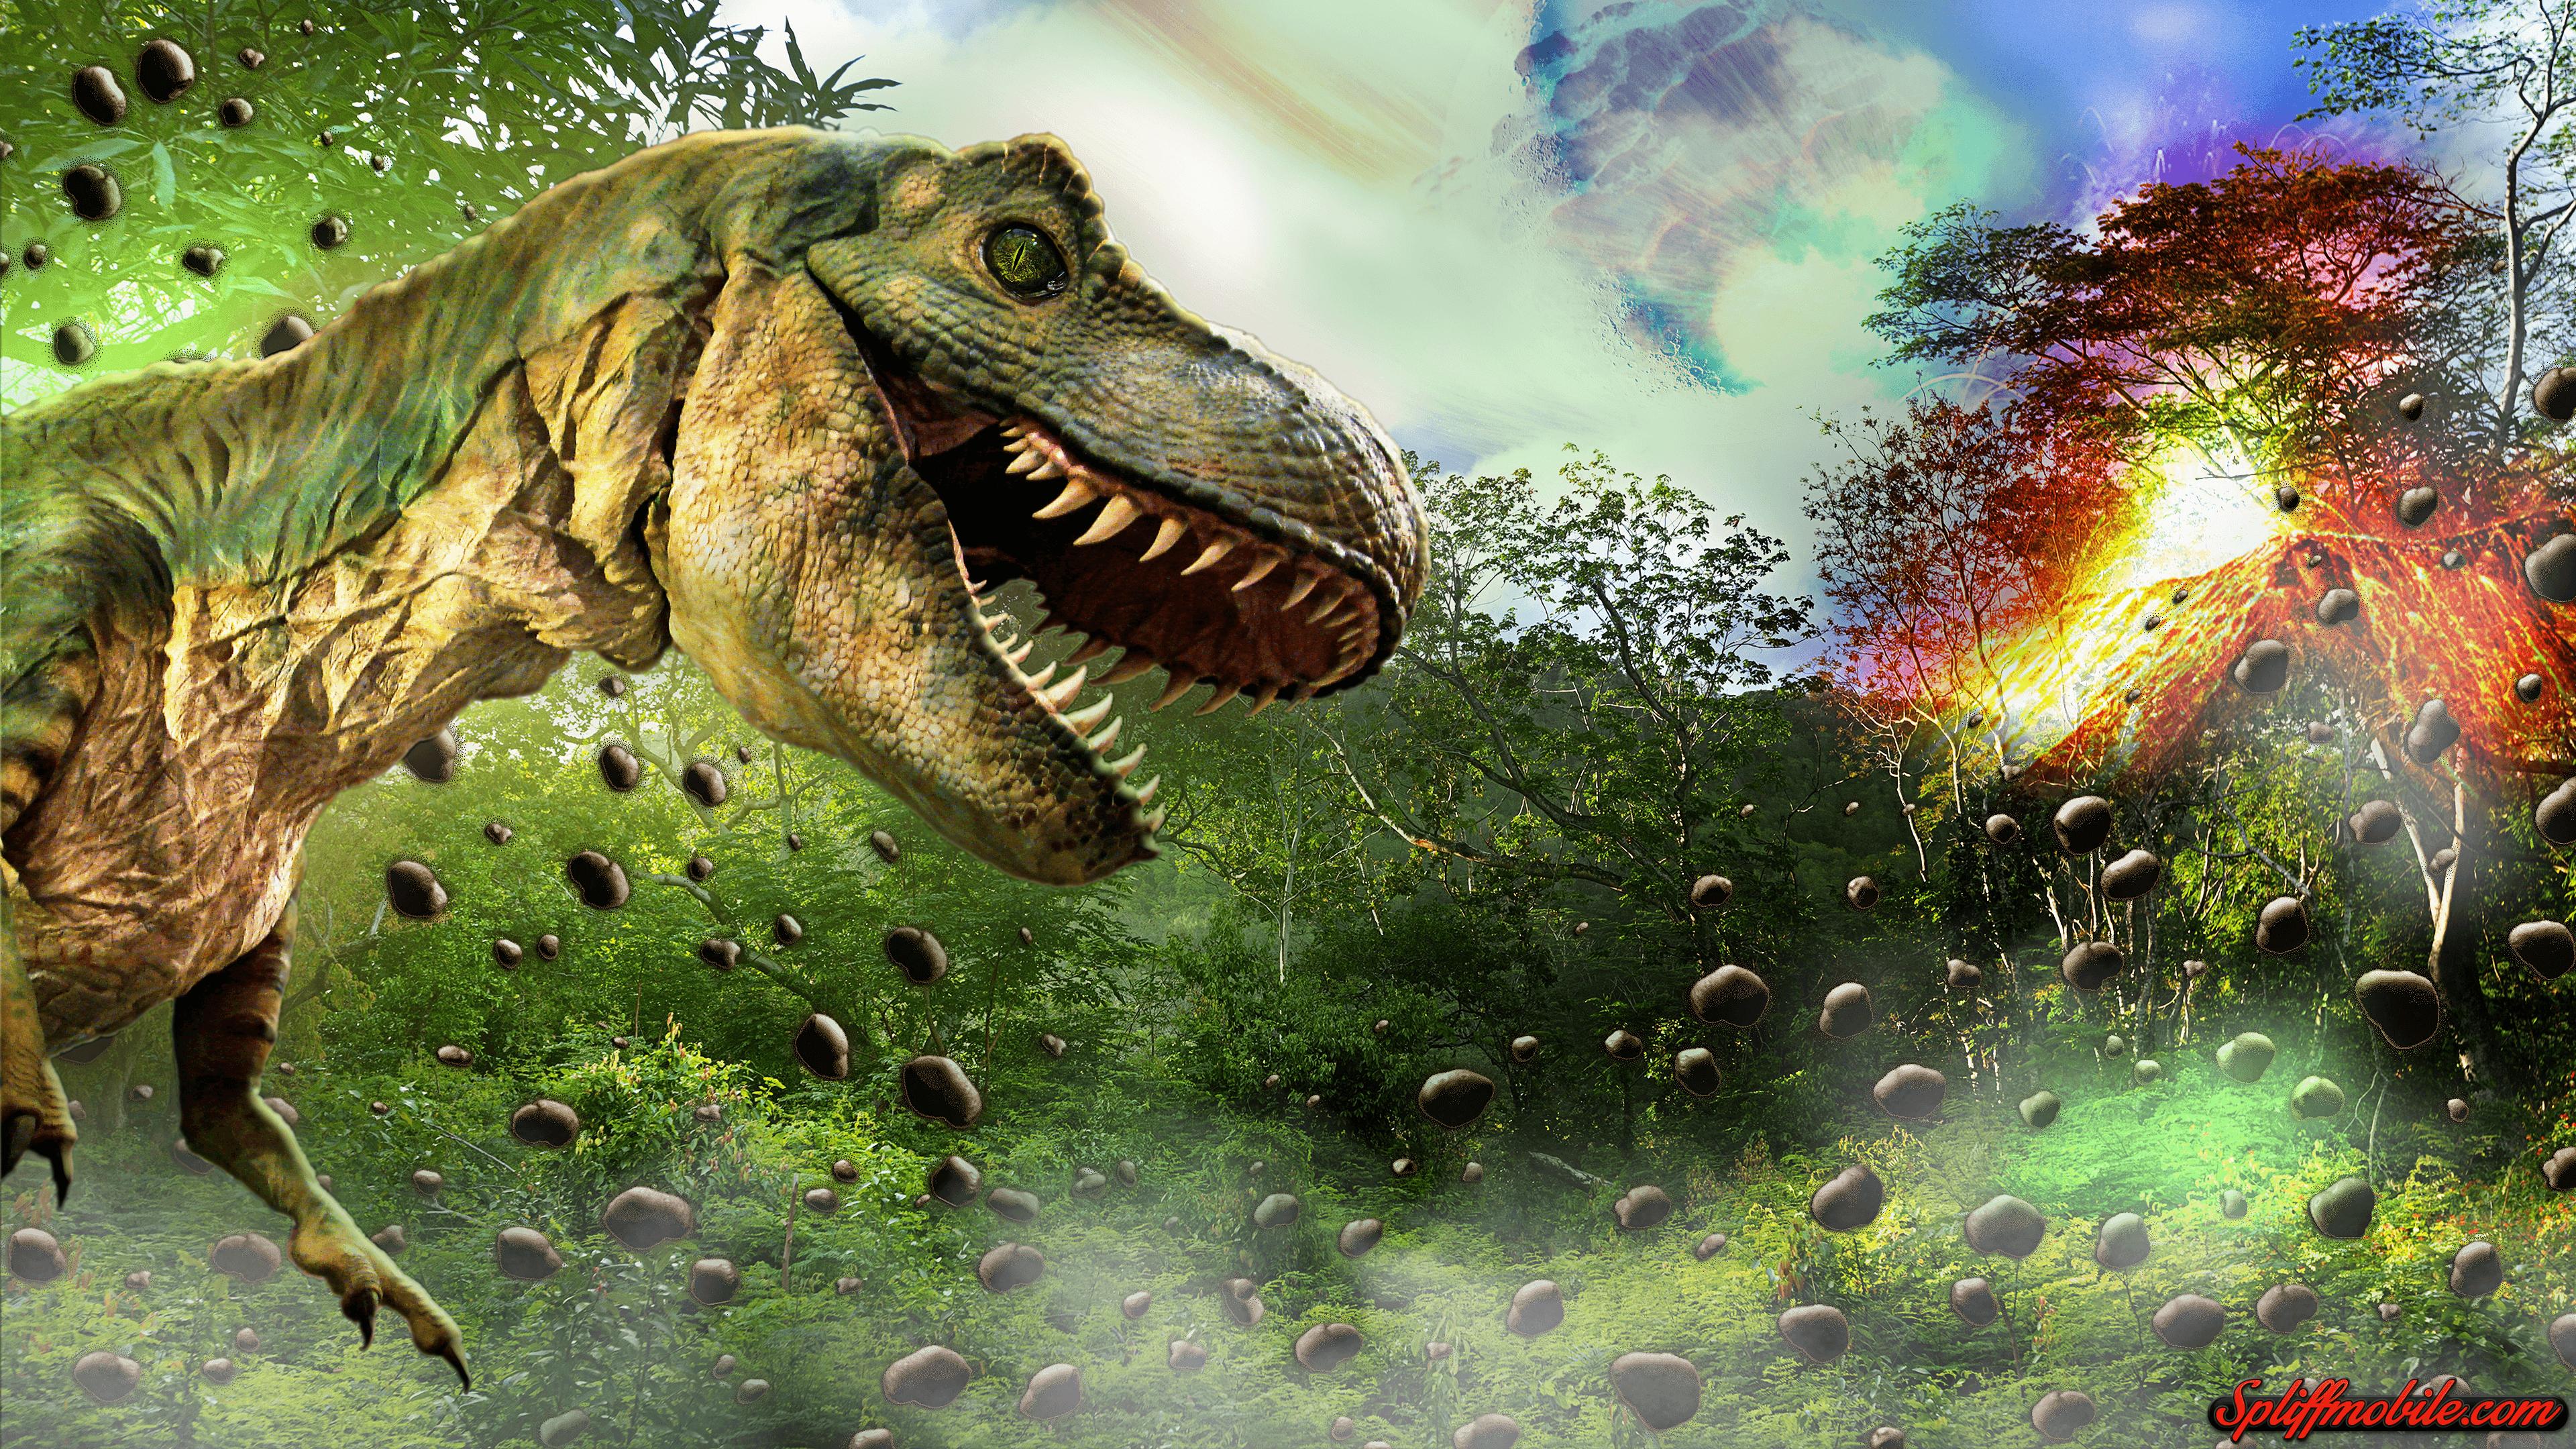 Dinosaur 4K Wallpapers - Top Free Dinosaur 4K Backgrounds